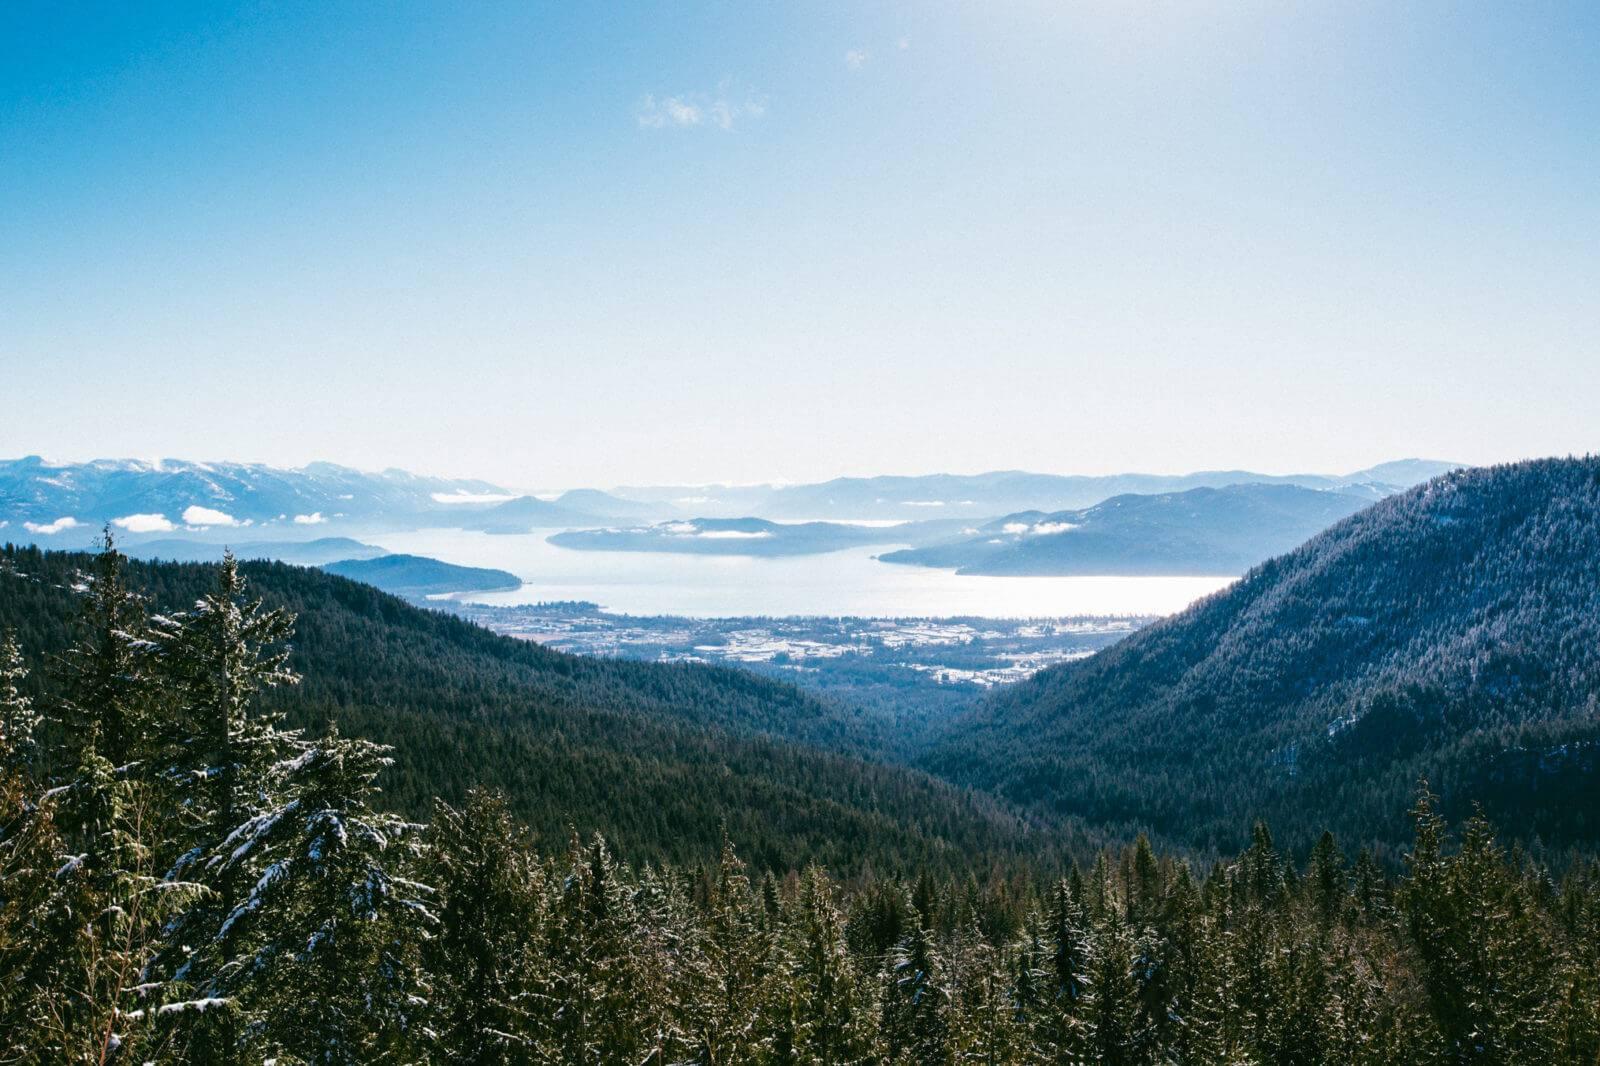 Scenic View of Lake Pend Oreille. Photo Credit: Idaho Tourism